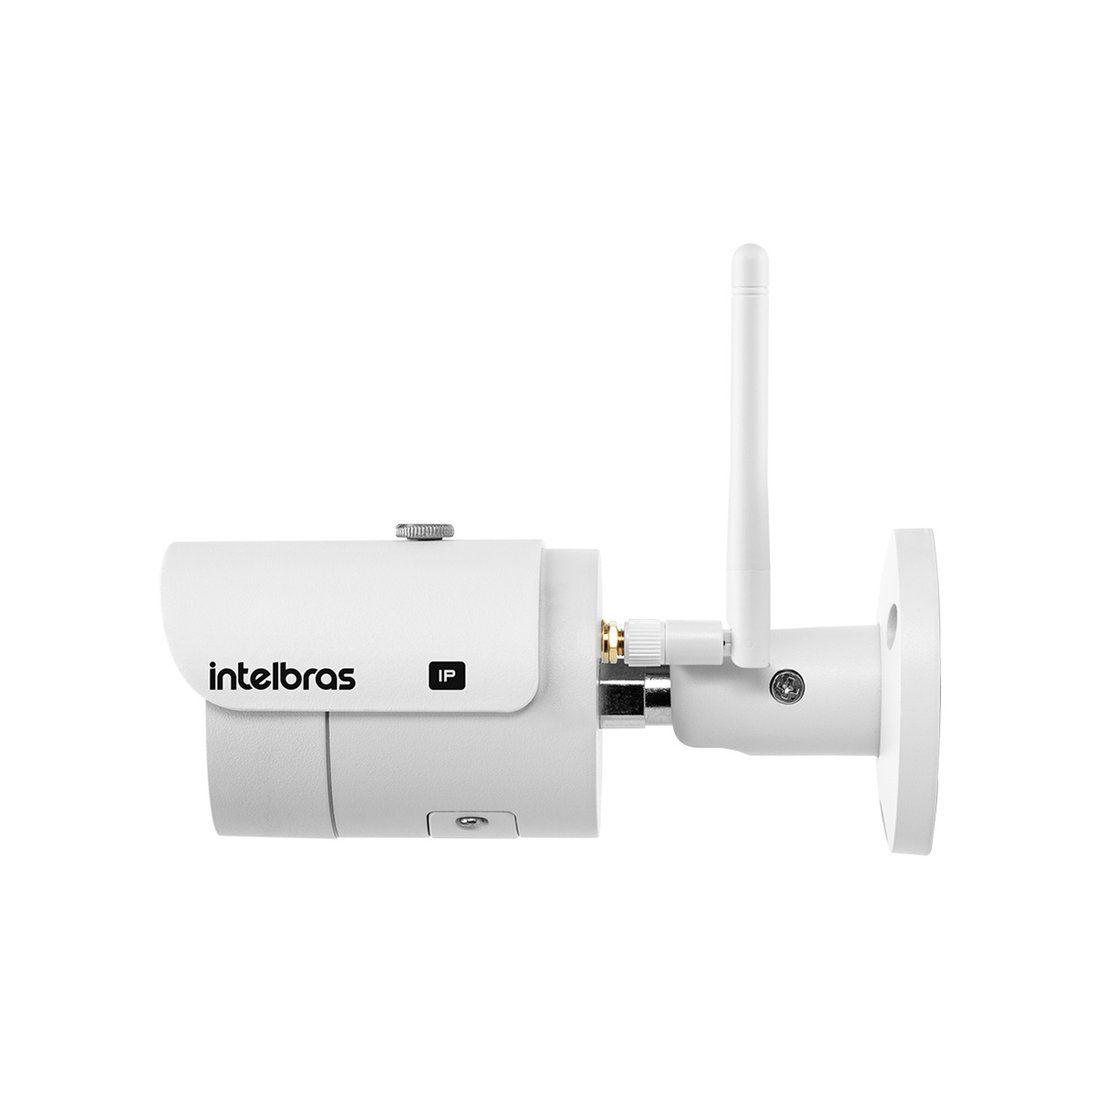 Câmera IP Wi-Fi Intelbras VIP 3430 W 4 Megapixel 30 Metros